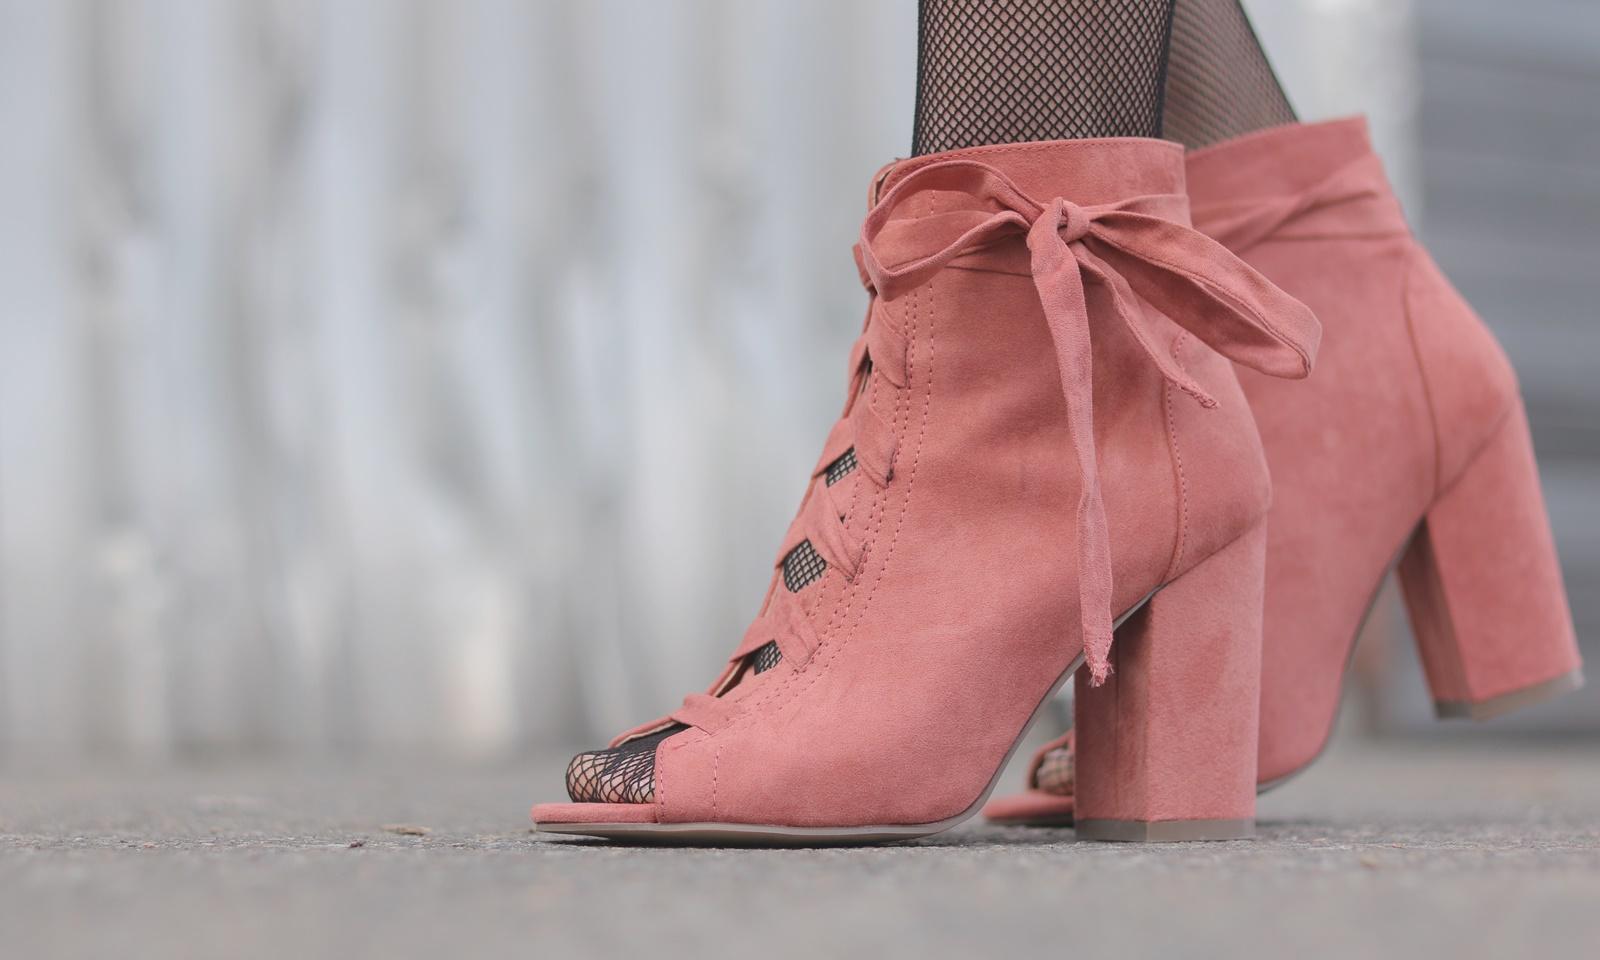 Schnüren Rosa Modeblogger Outfit Zum Justfab Stiefeletten CsdoxrtBhQ